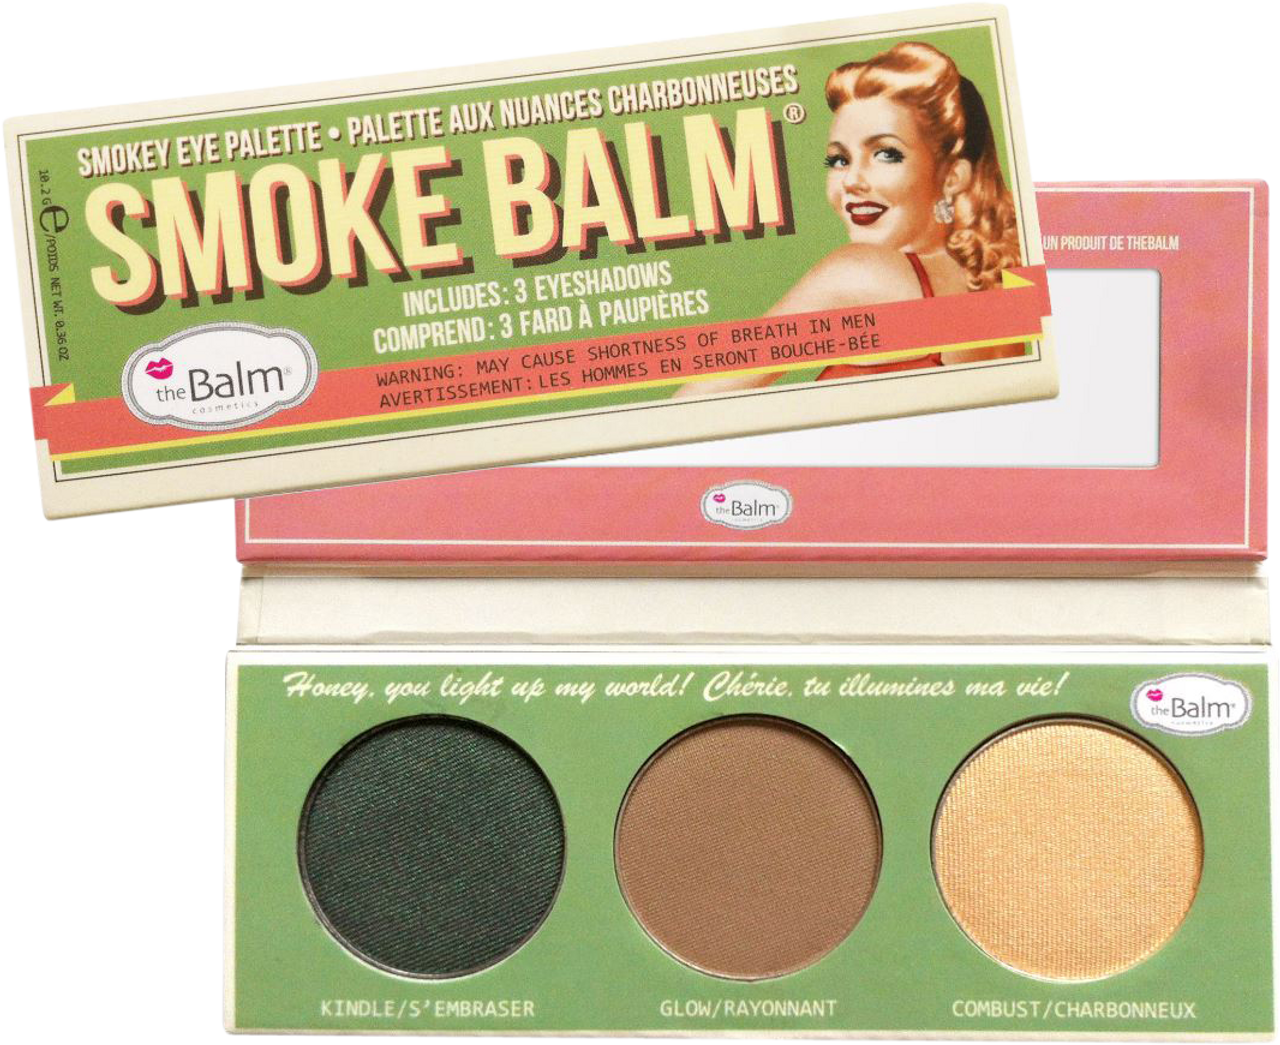 1e4954019f6 The Balm Smoke Balm Palette 2 | Bath & Unwind | Official Stockist